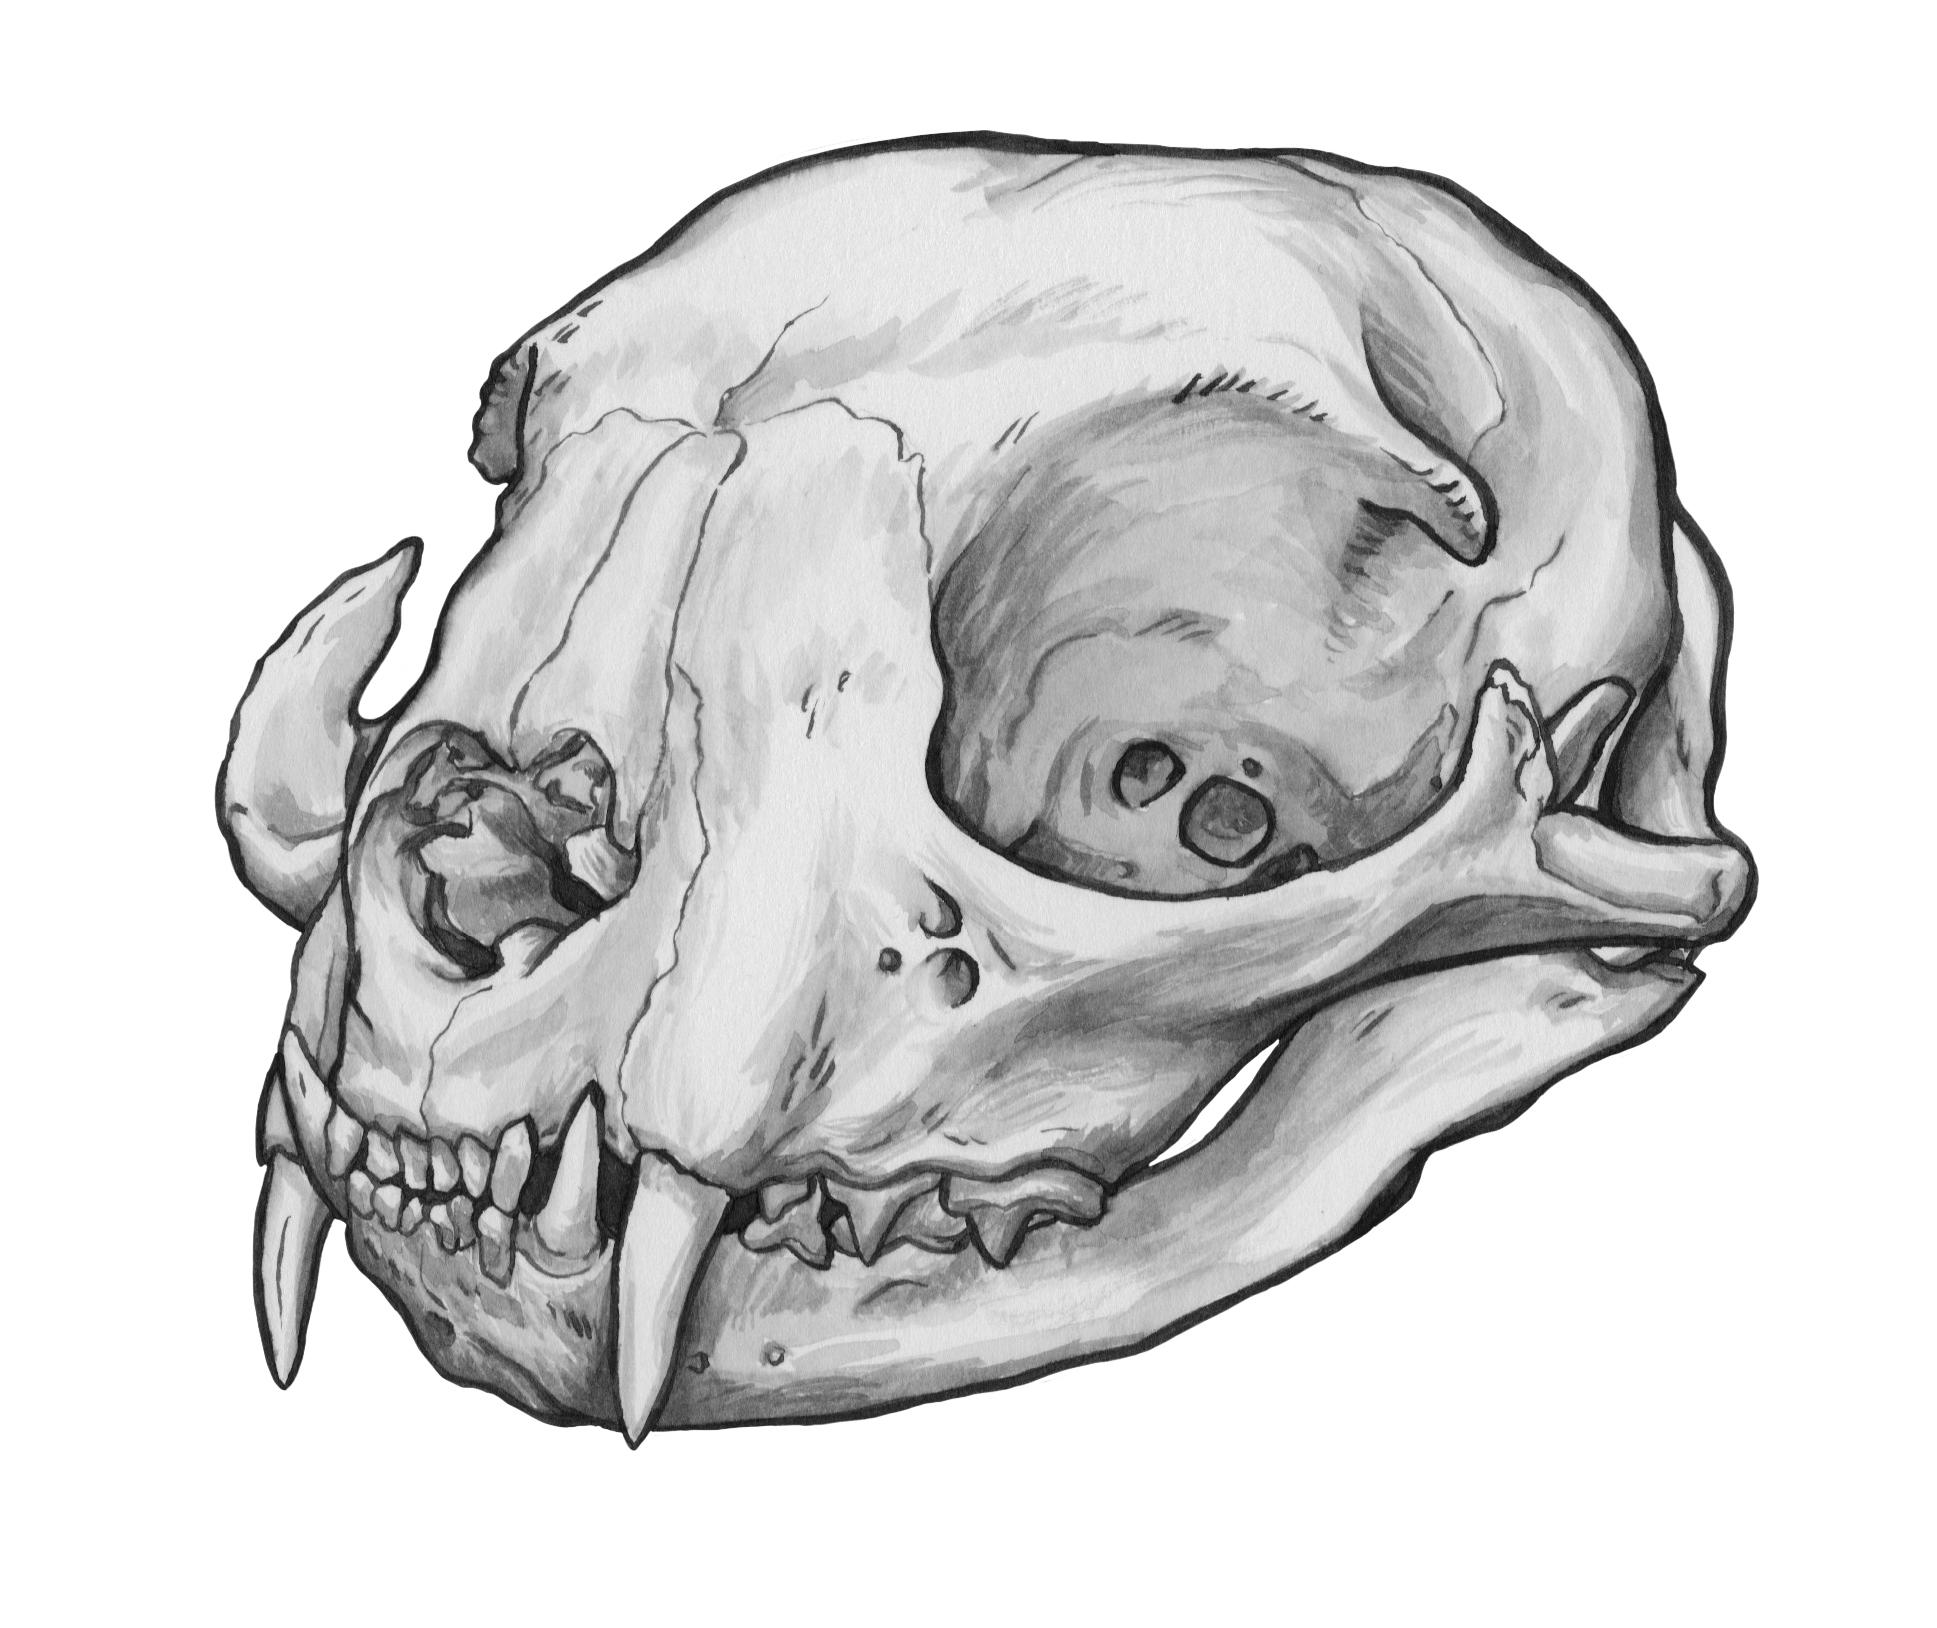 Animal Skull Illustration | www.pixshark.com - Images ...